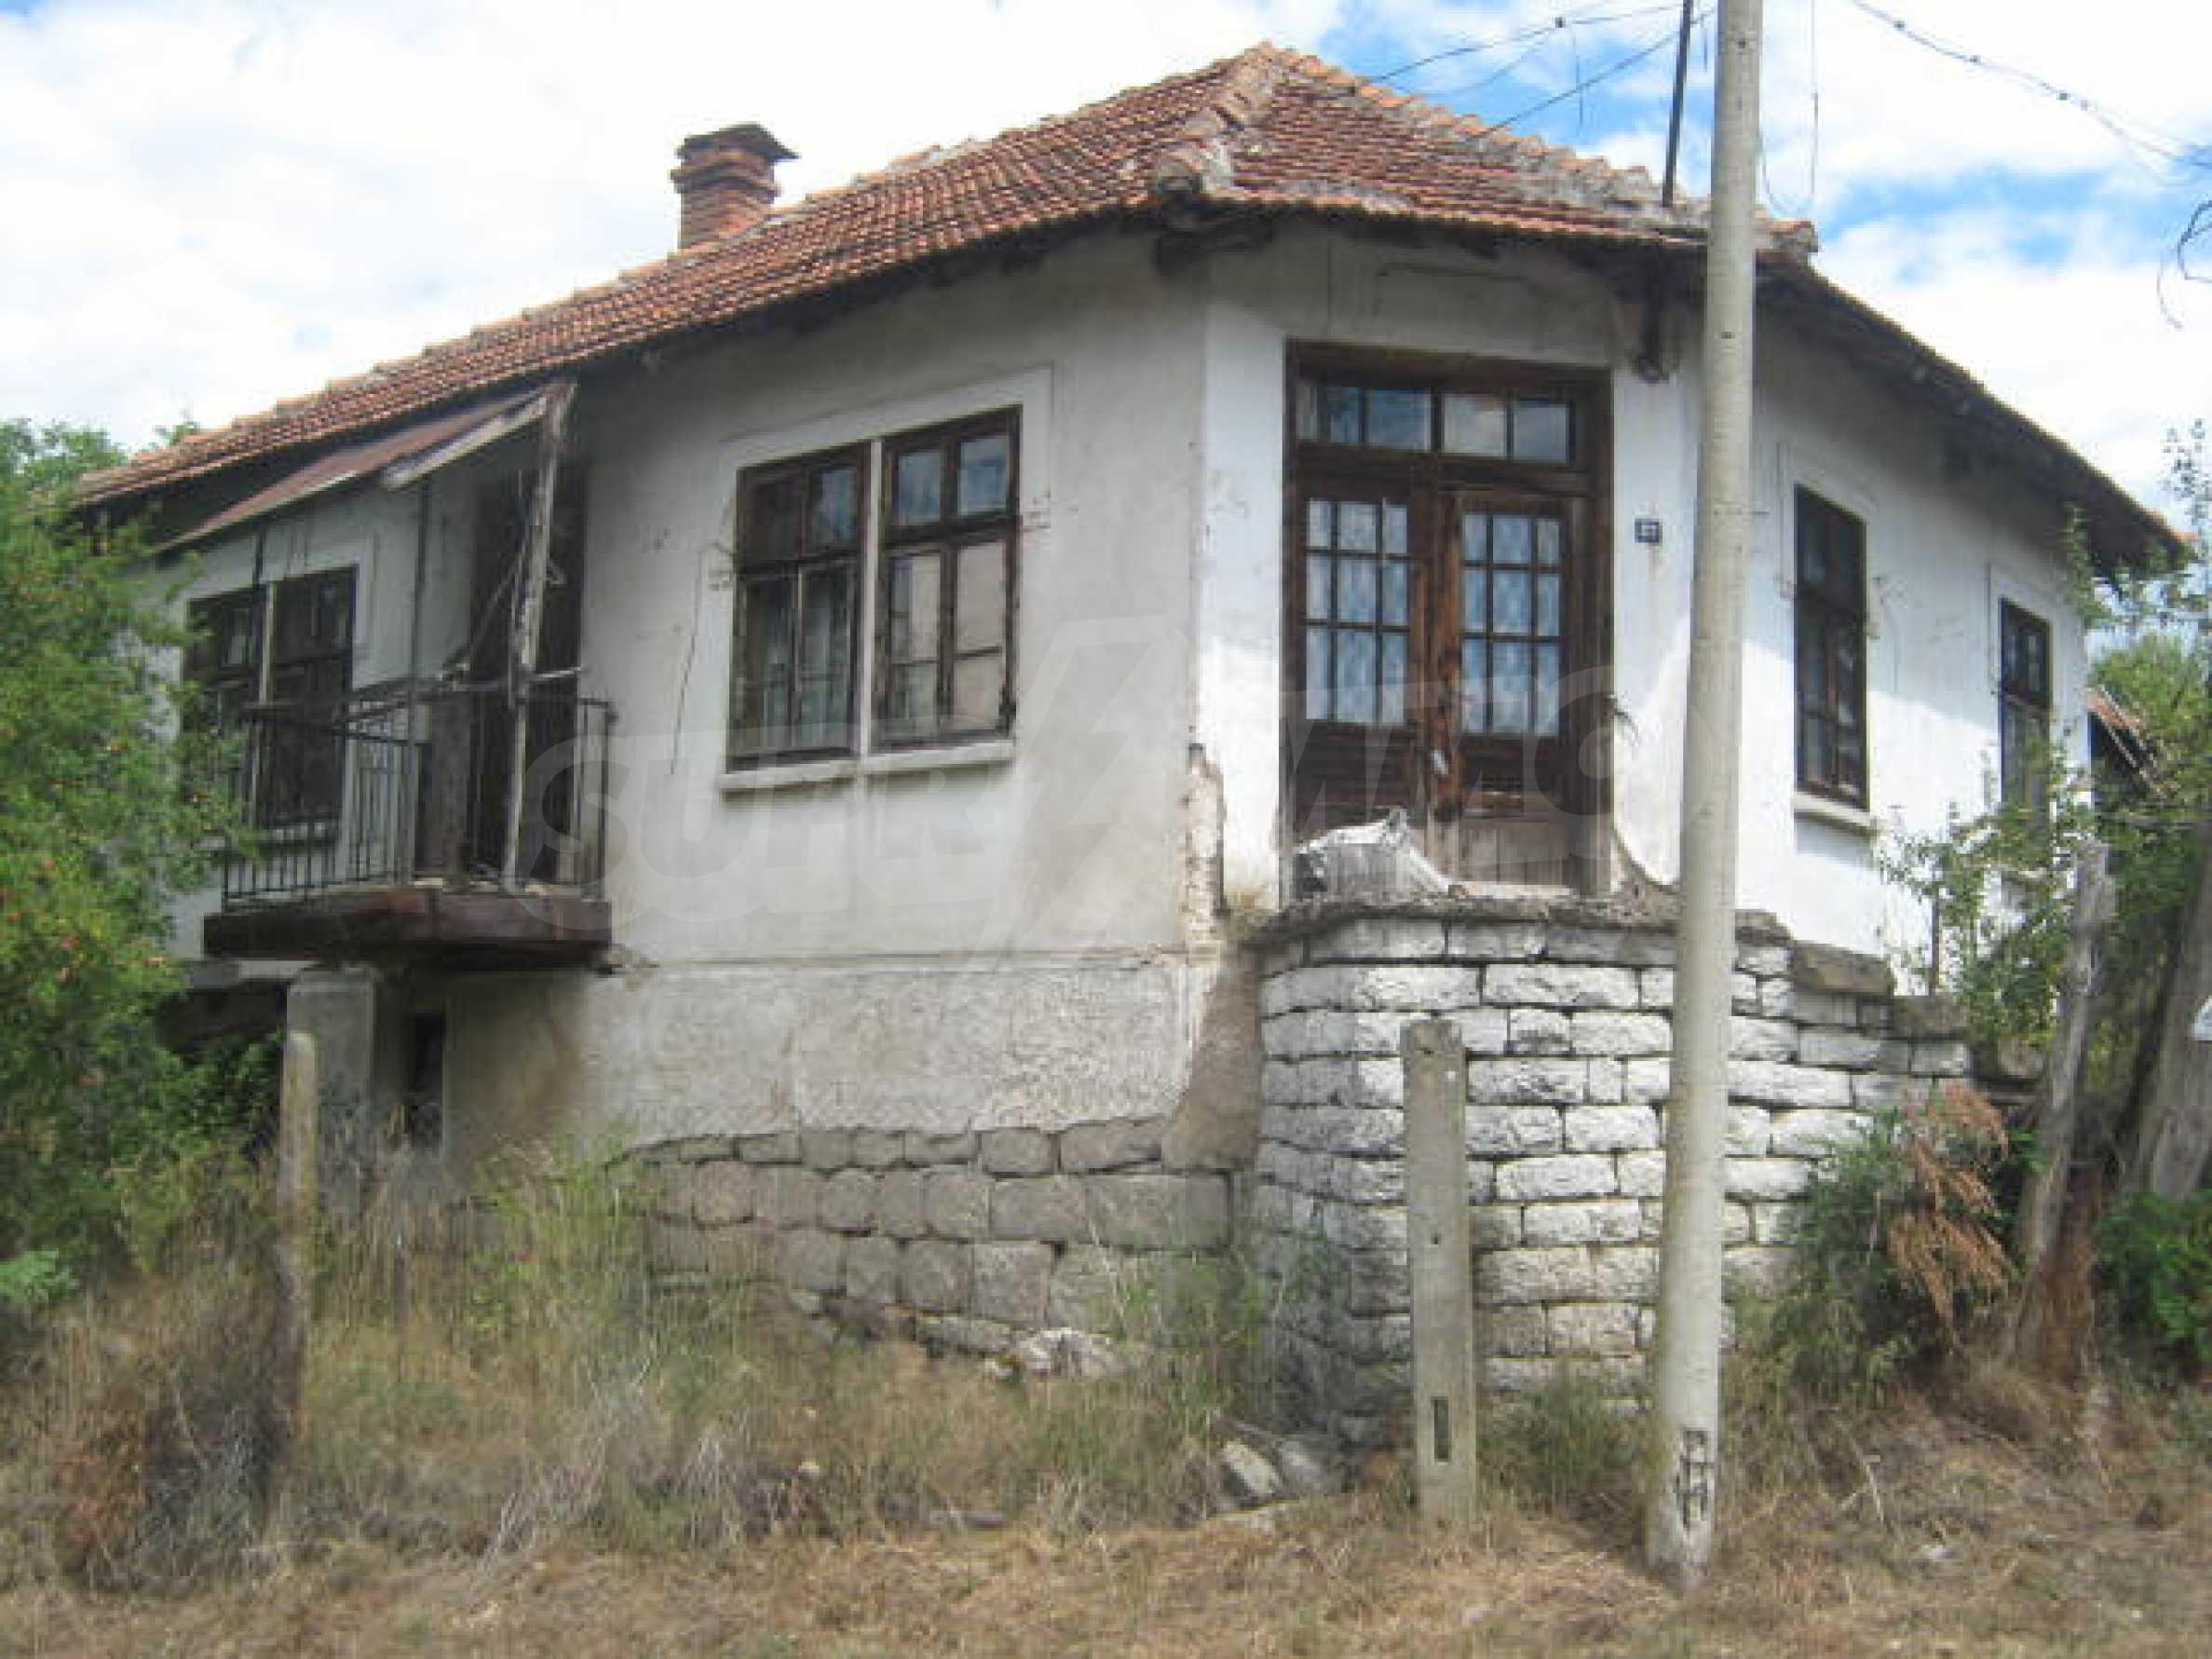 House in a village close to Belogradchik